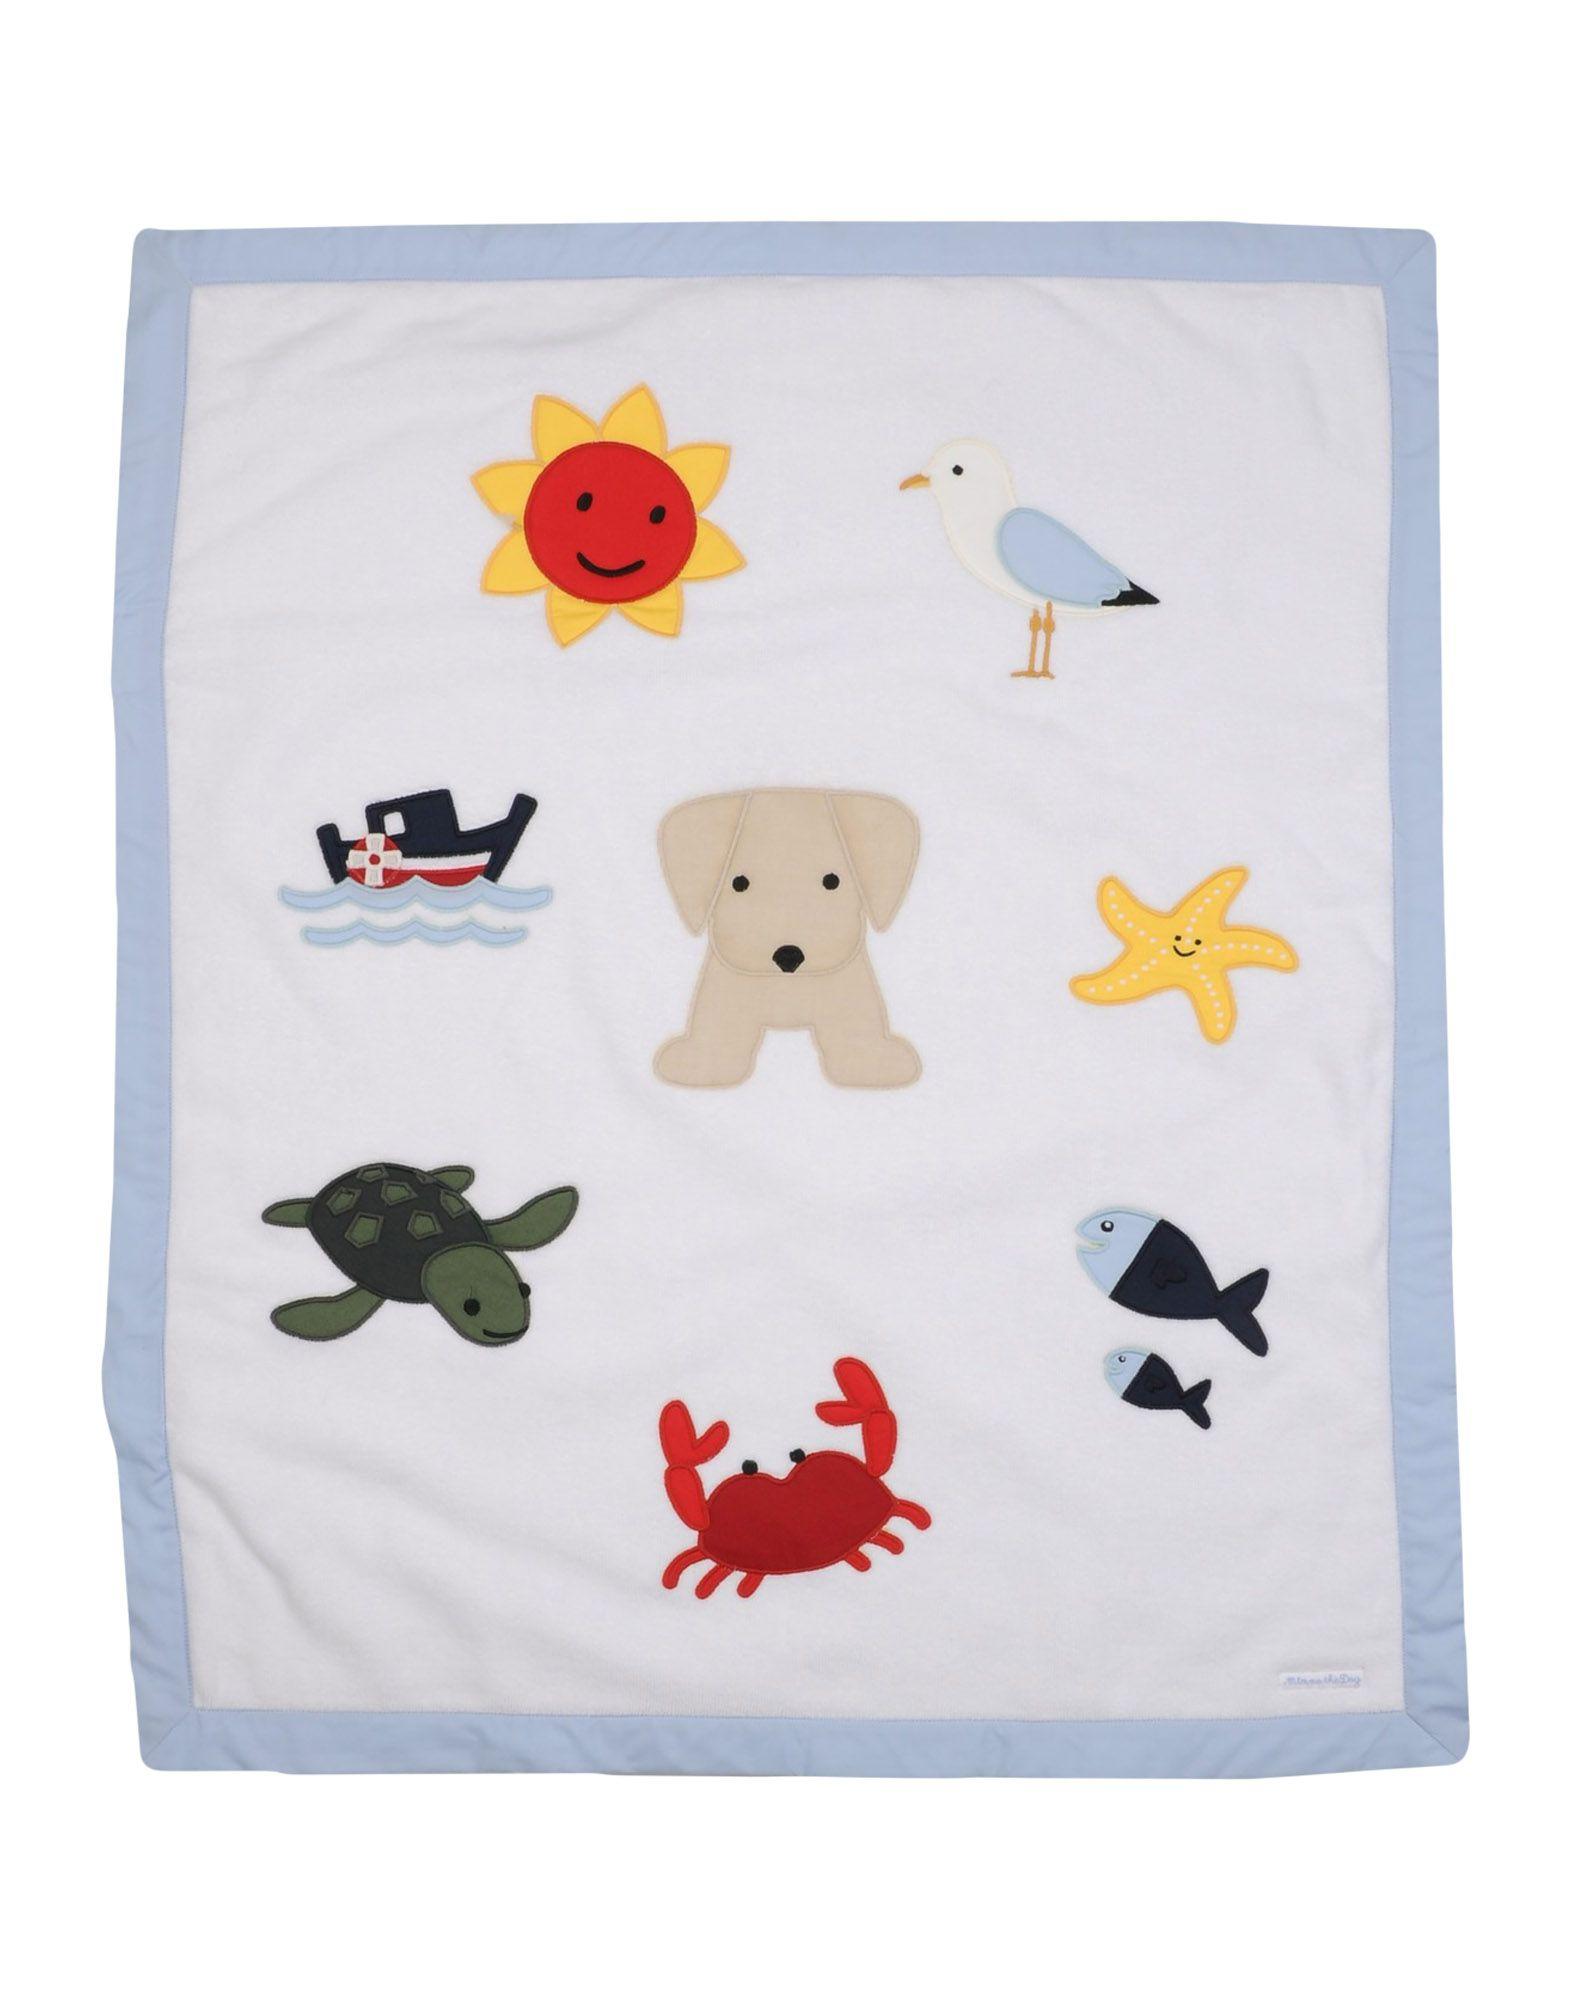 DOLCE & GABBANA Одеяльце для младенцев круг для купания младенцев flipper отзывы